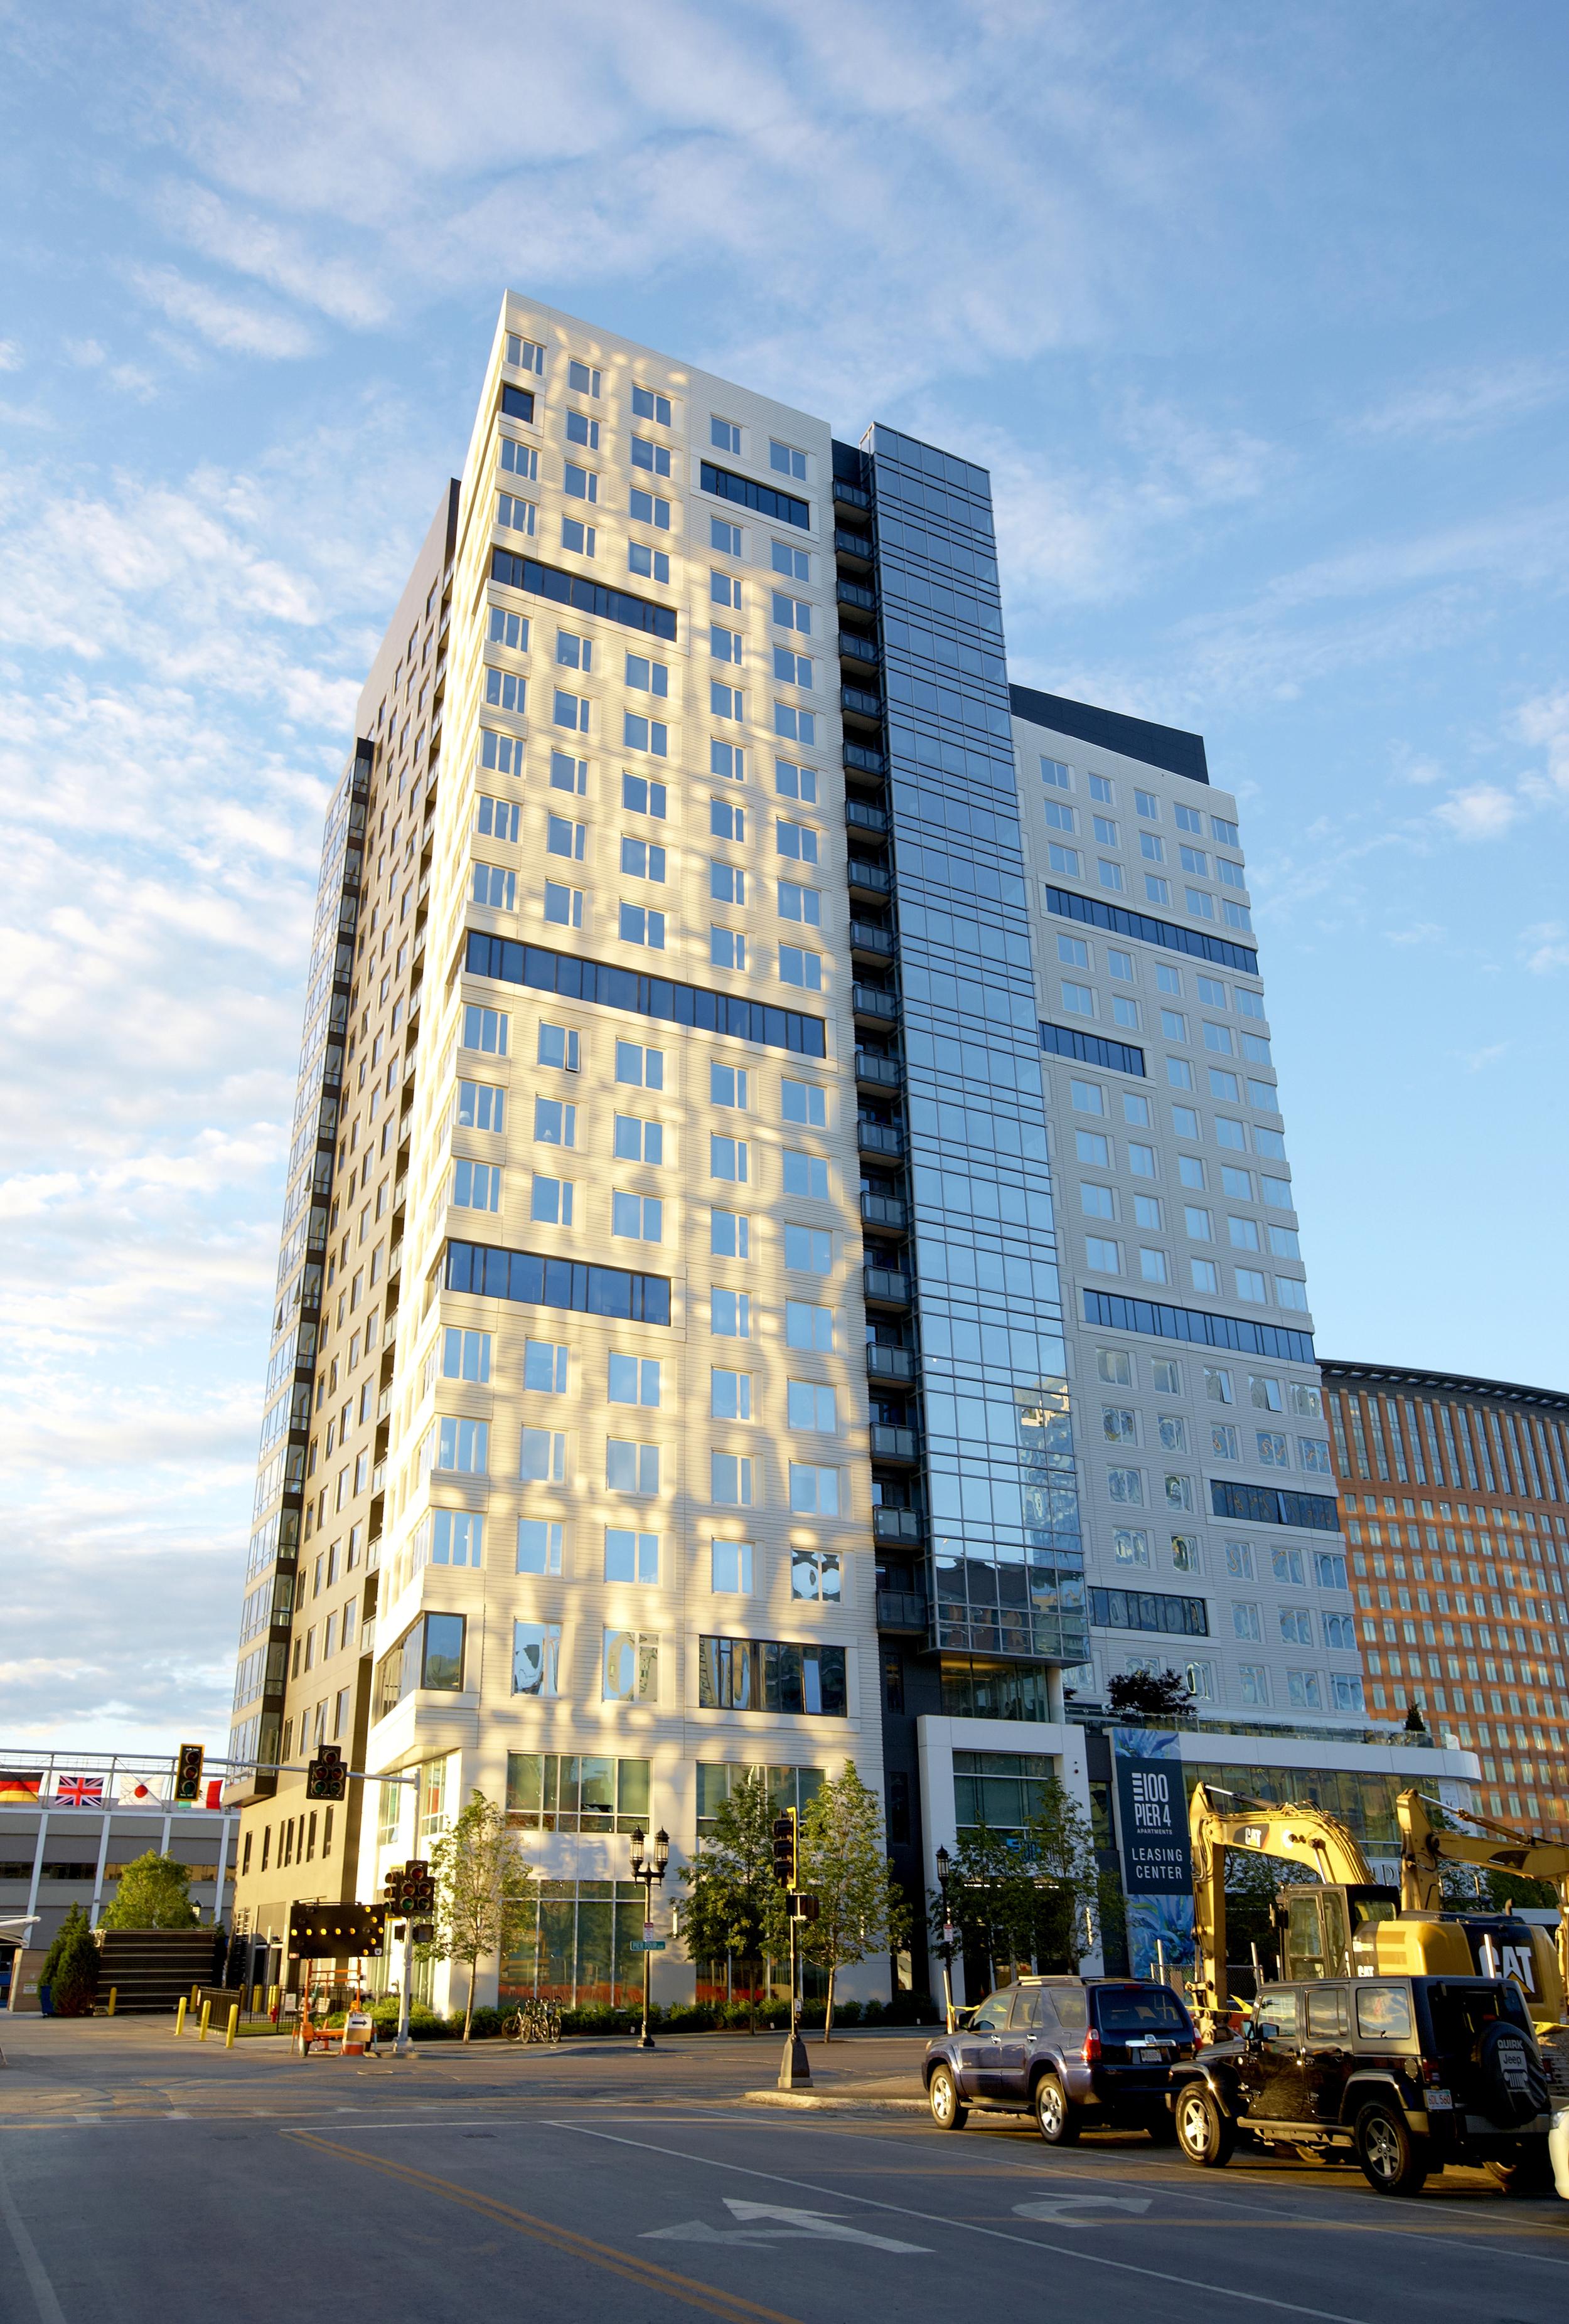 Boston tall building 10 drama.jpg